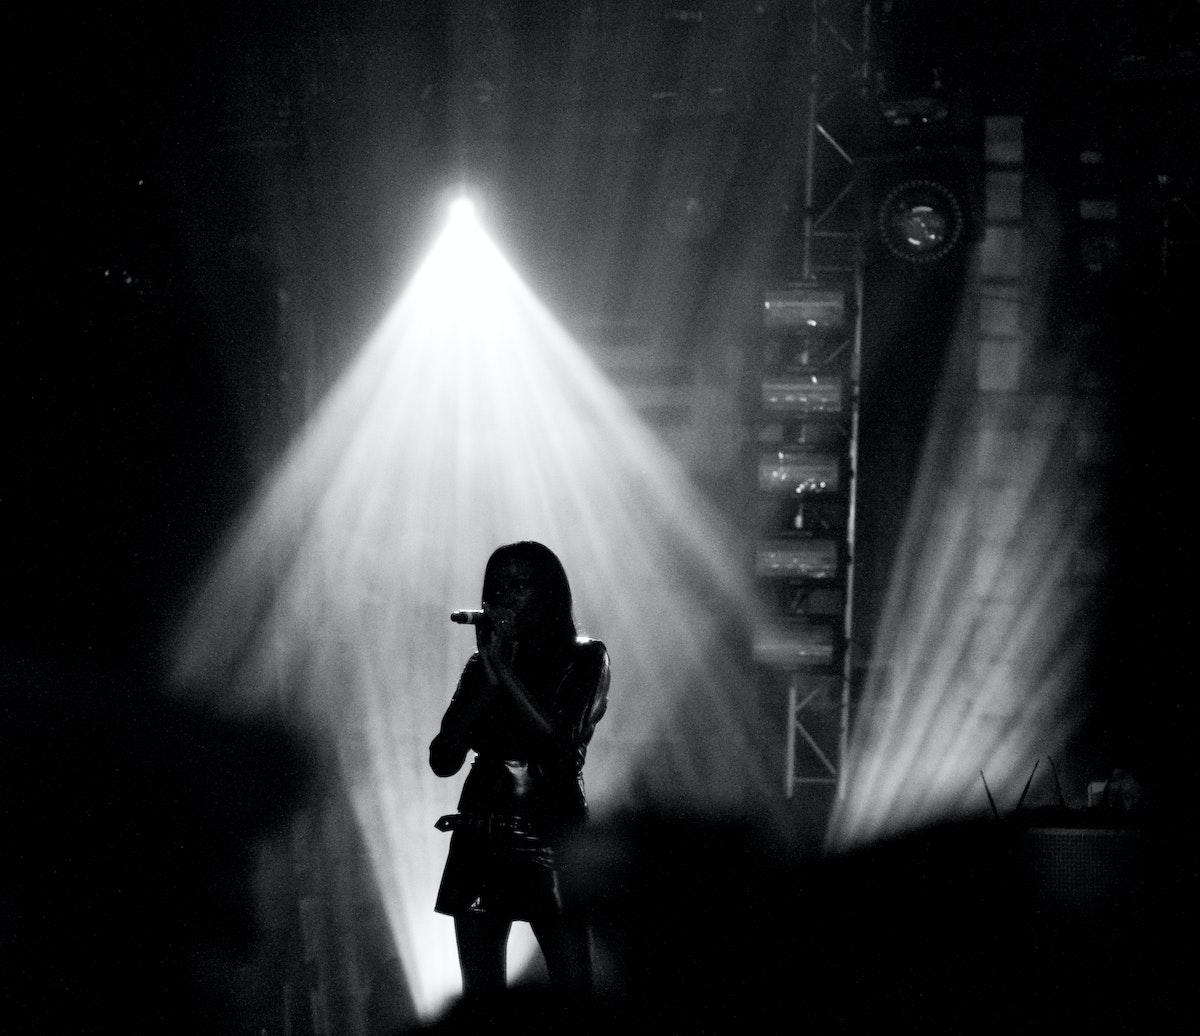 Back up singer in light